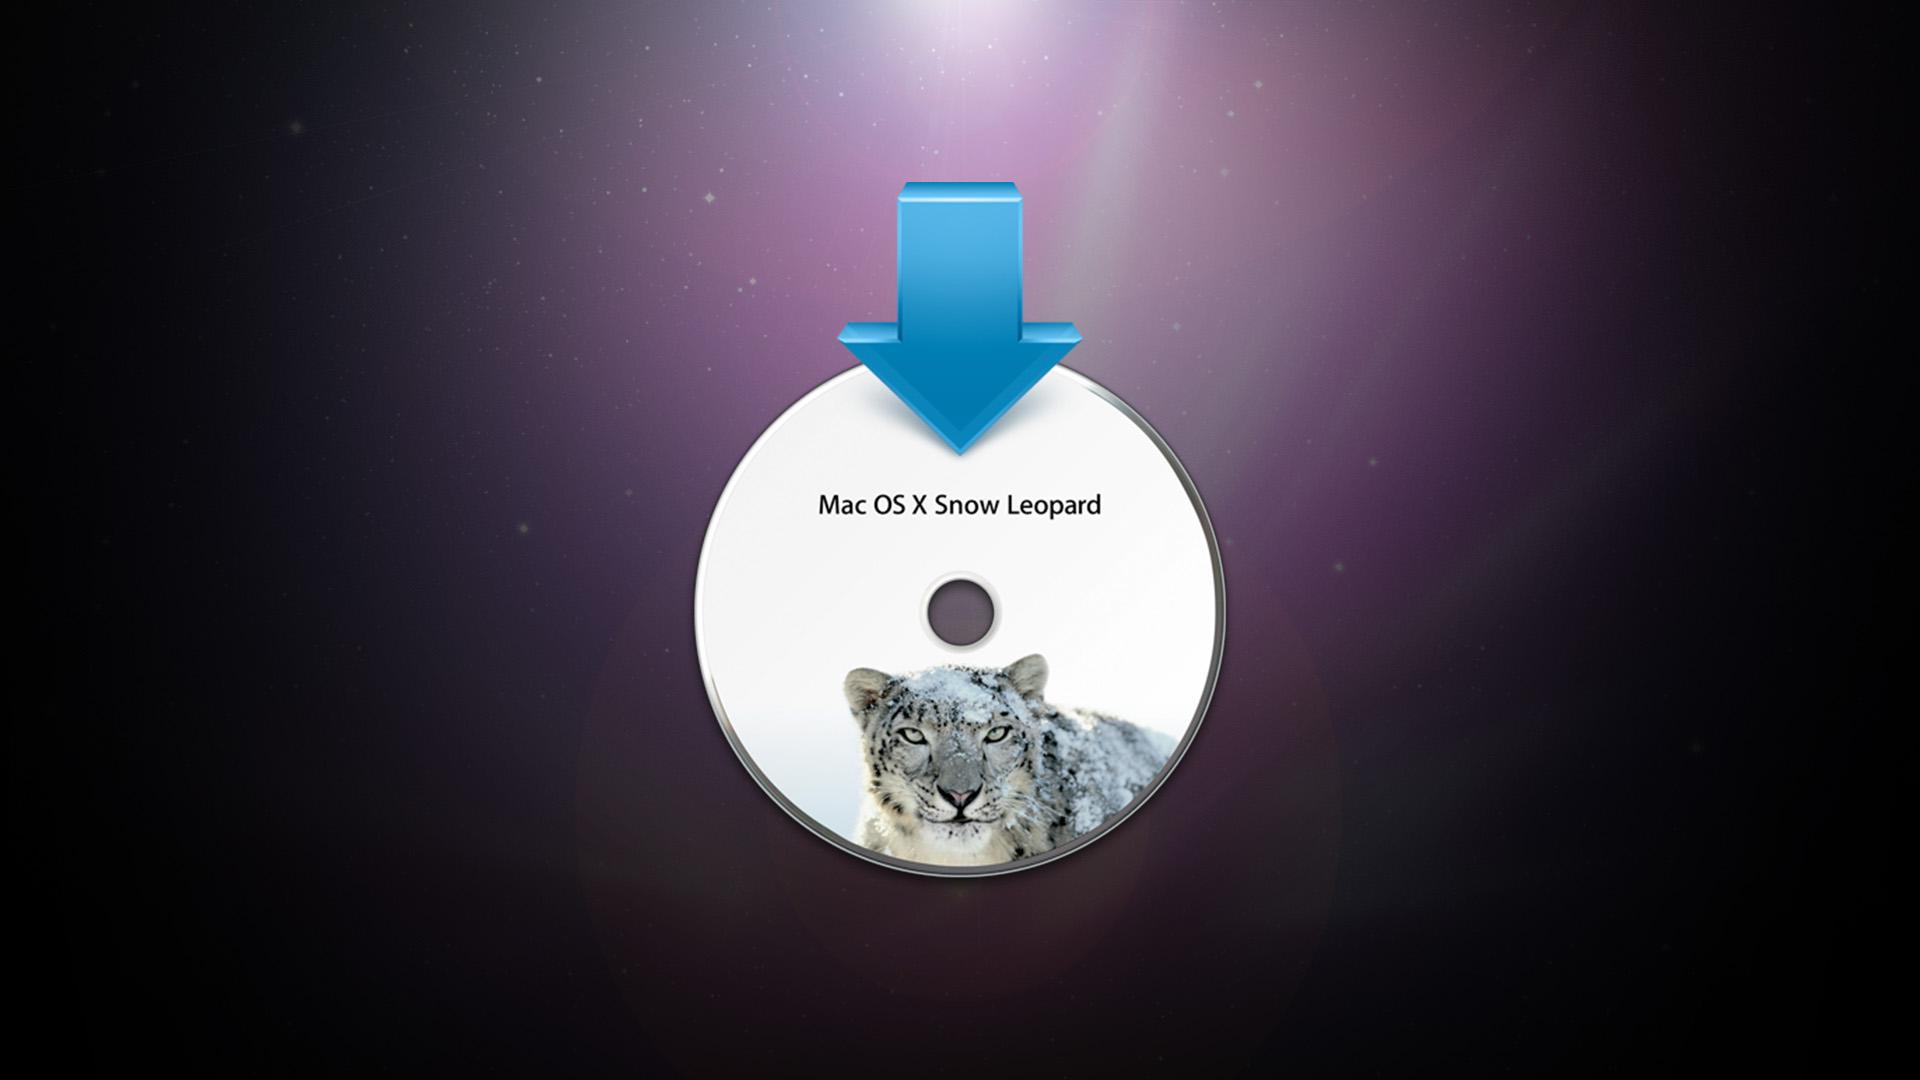 ICLOUD MAC OS X 10.6.8 GRATUIT